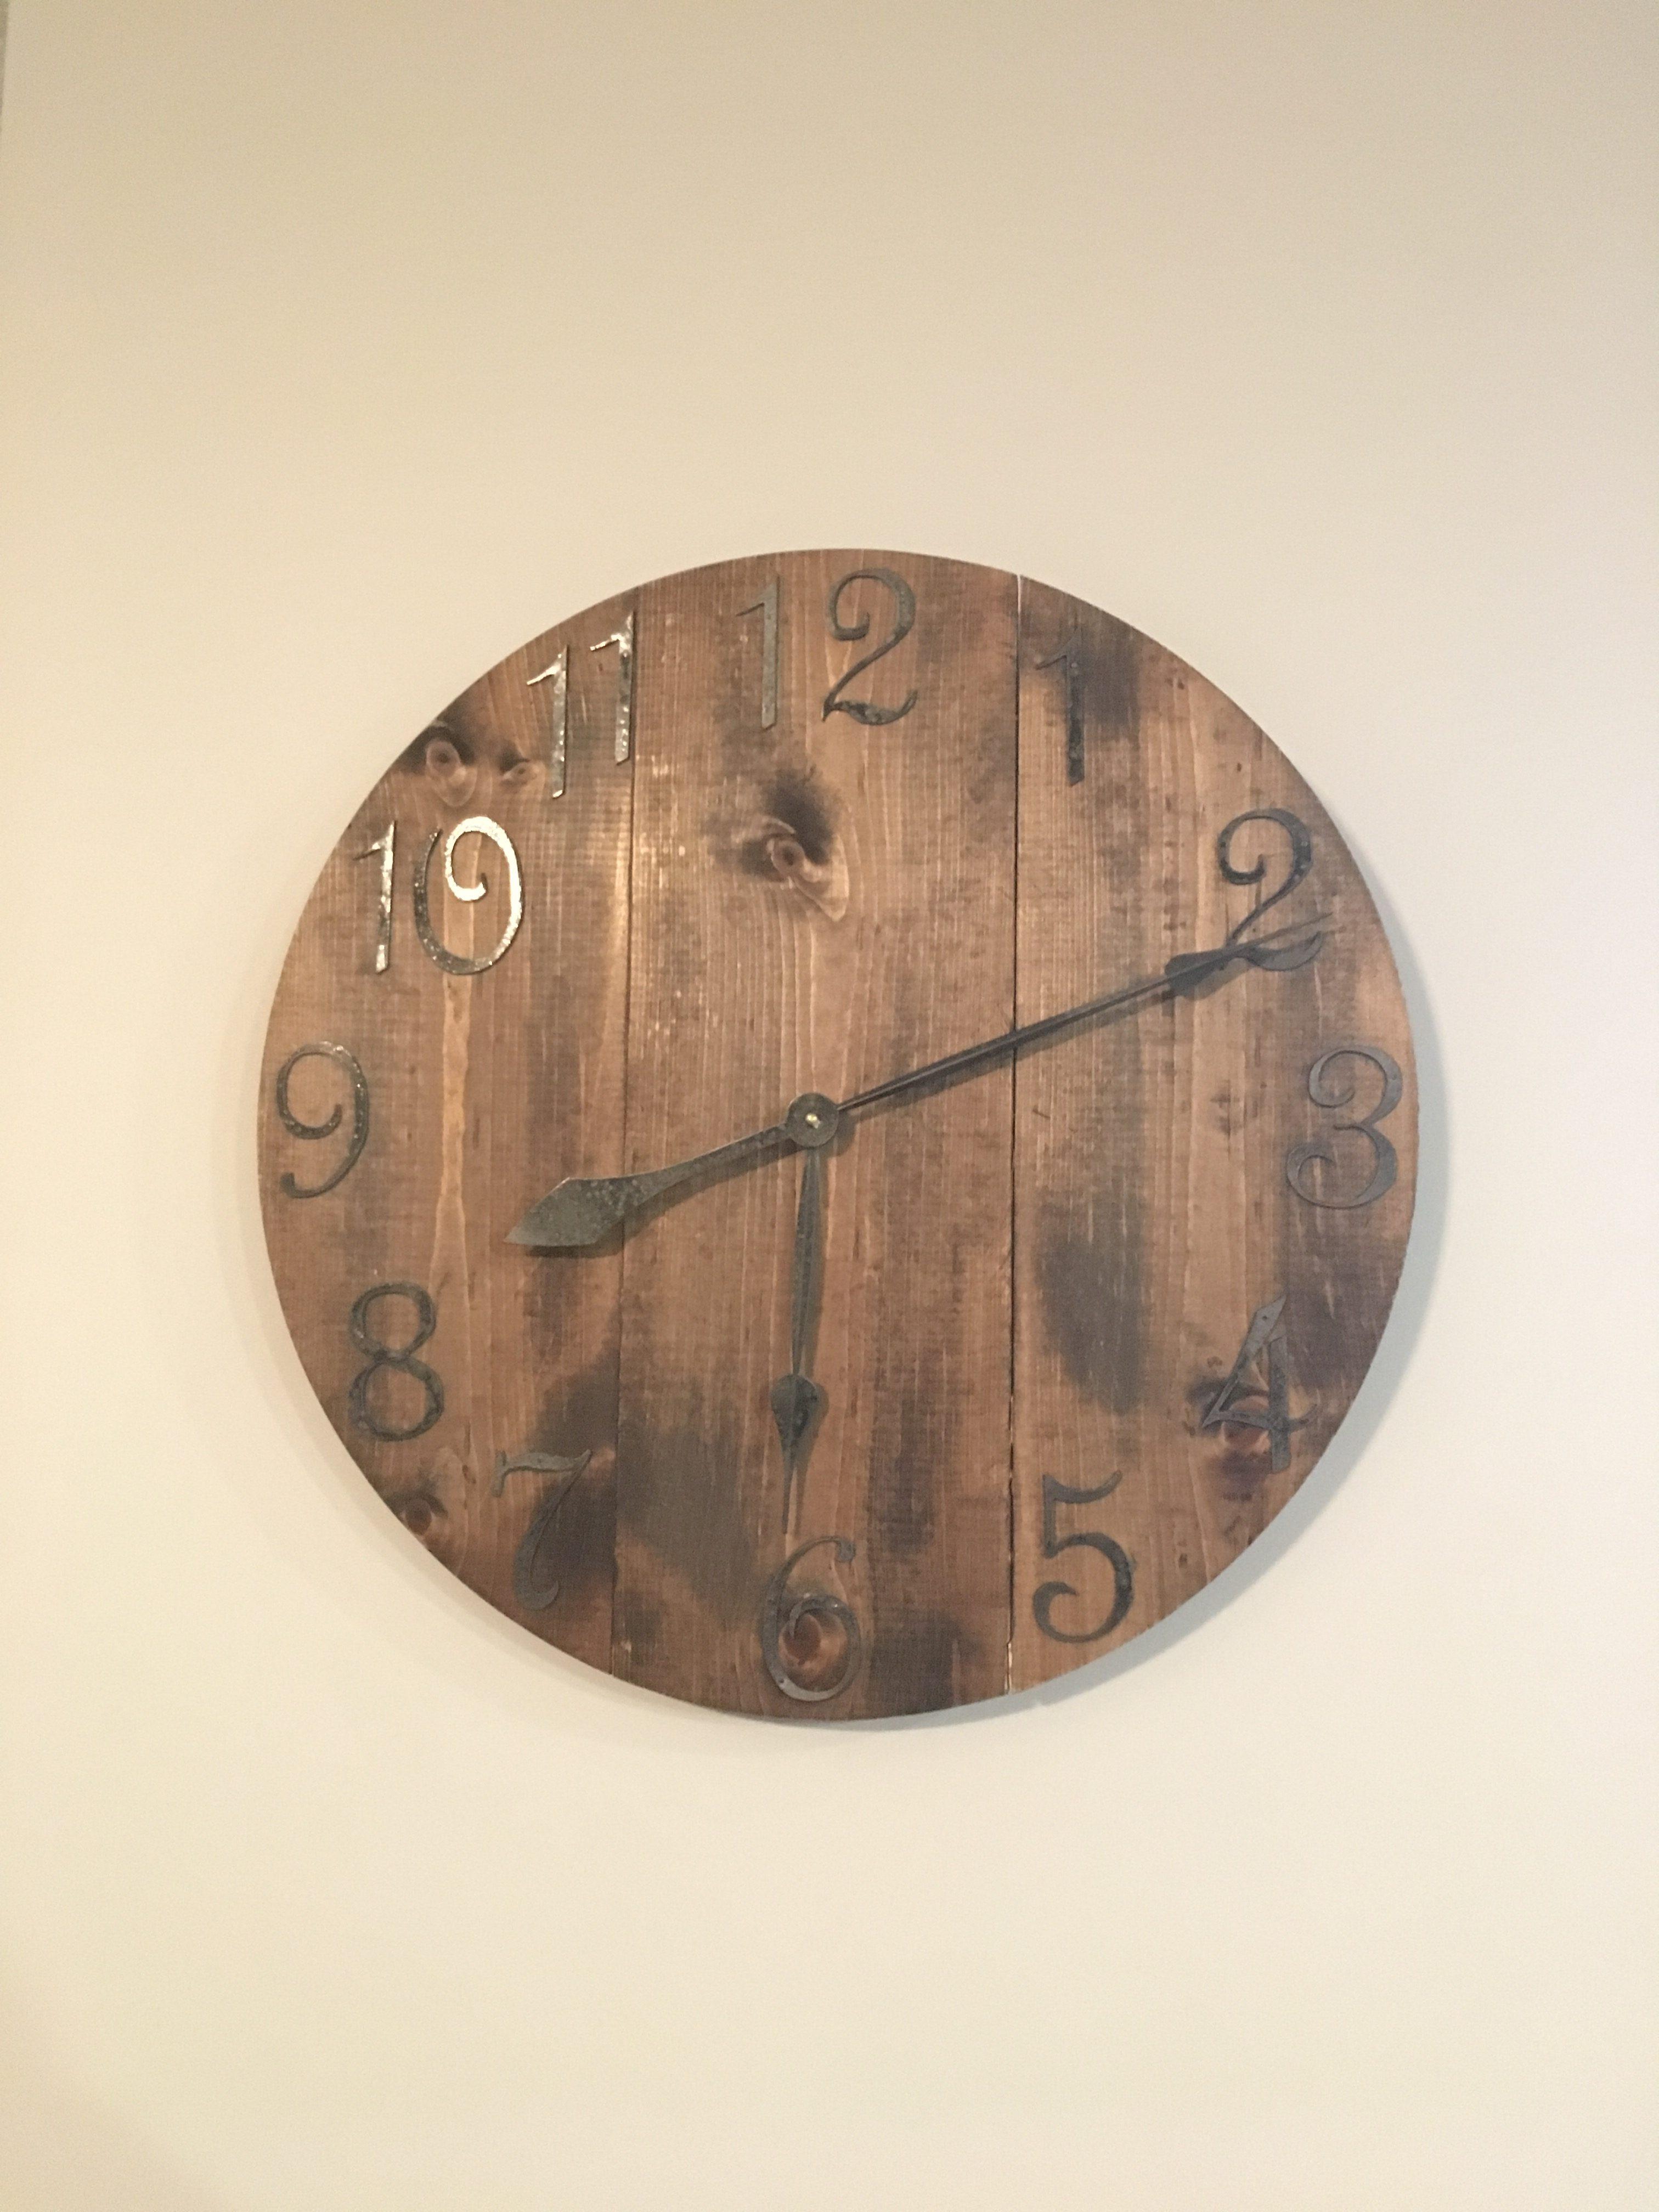 Large rustic wood clock large wall clock unique wall clock farmhouse clock farmhouse decor